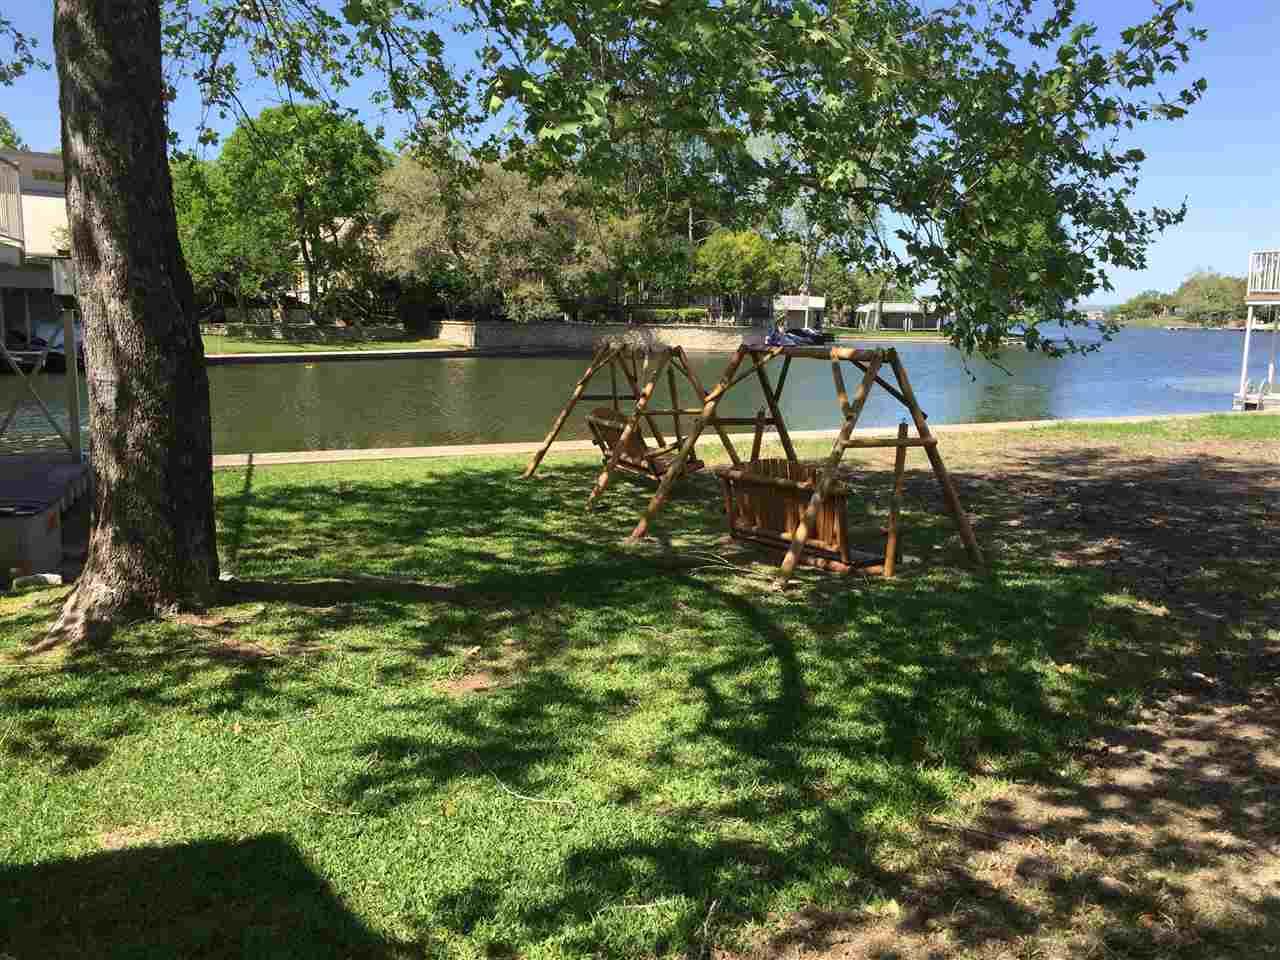 Additional photo for property listing at 21057-A Hi Circle North  Horseshoe Bay, Texas 78657 Estados Unidos